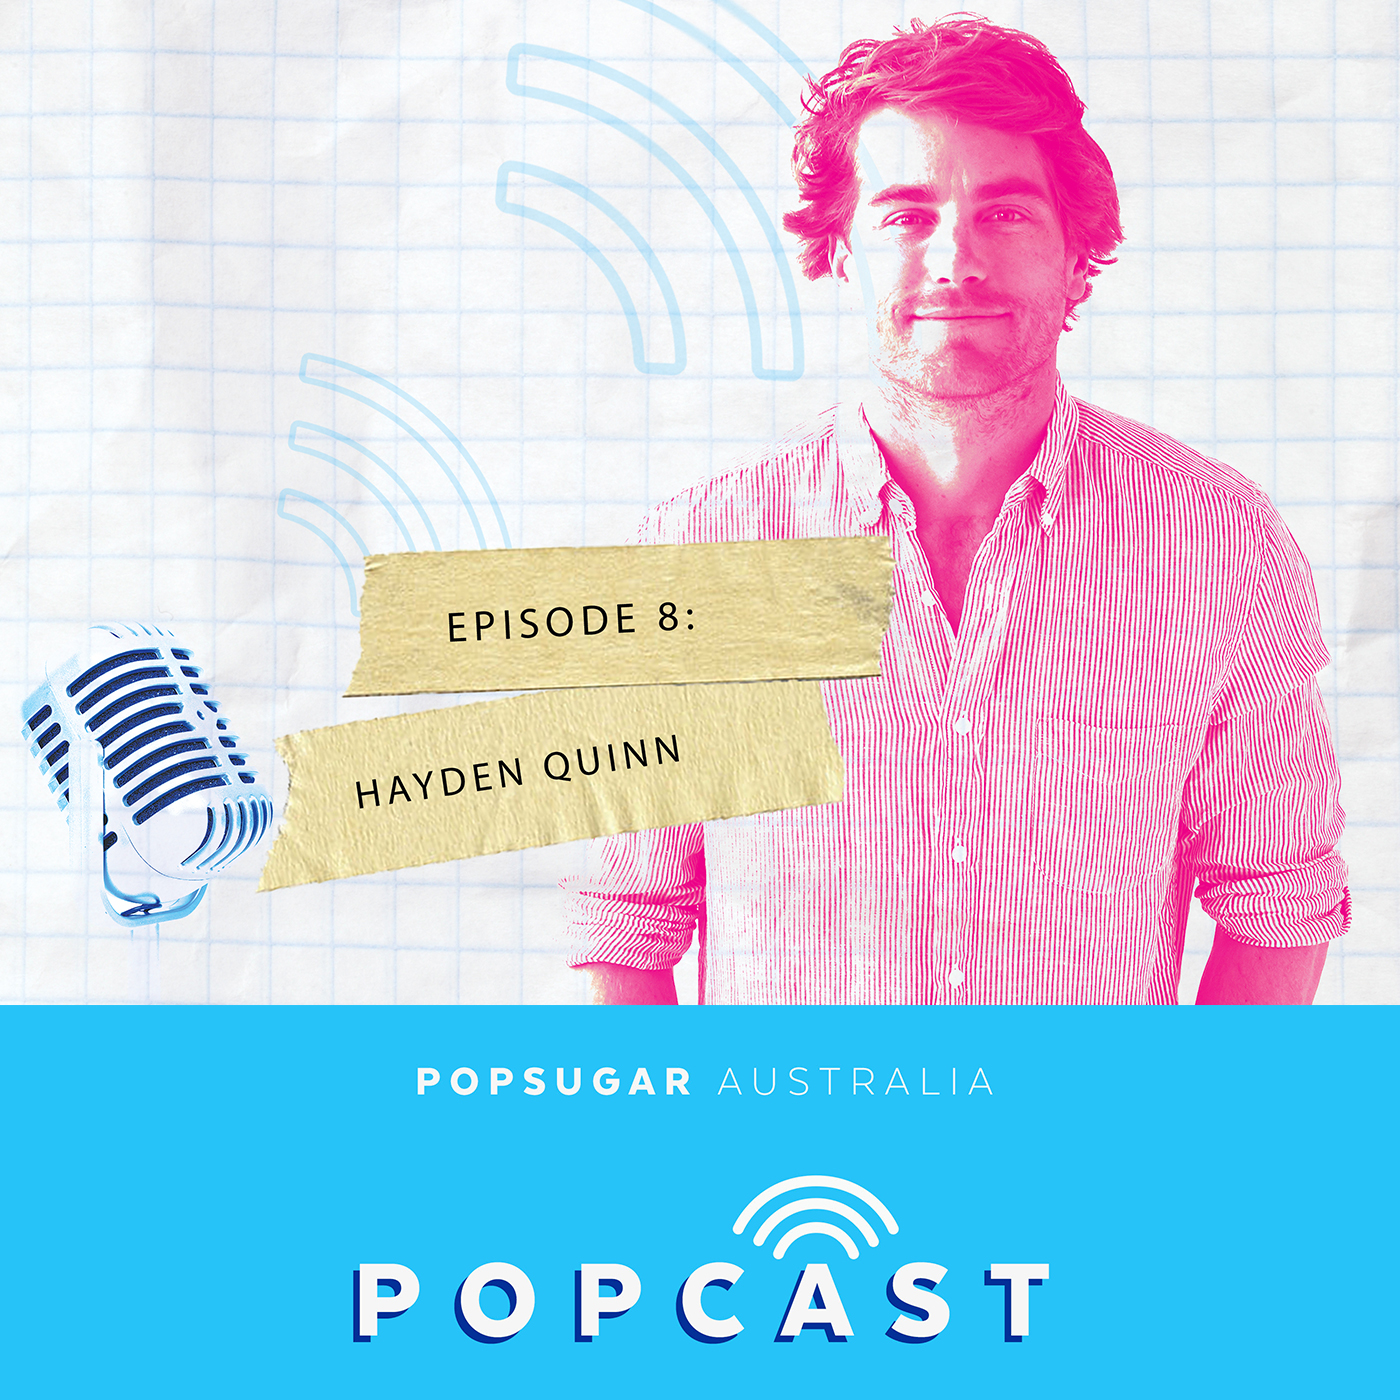 hq popcast